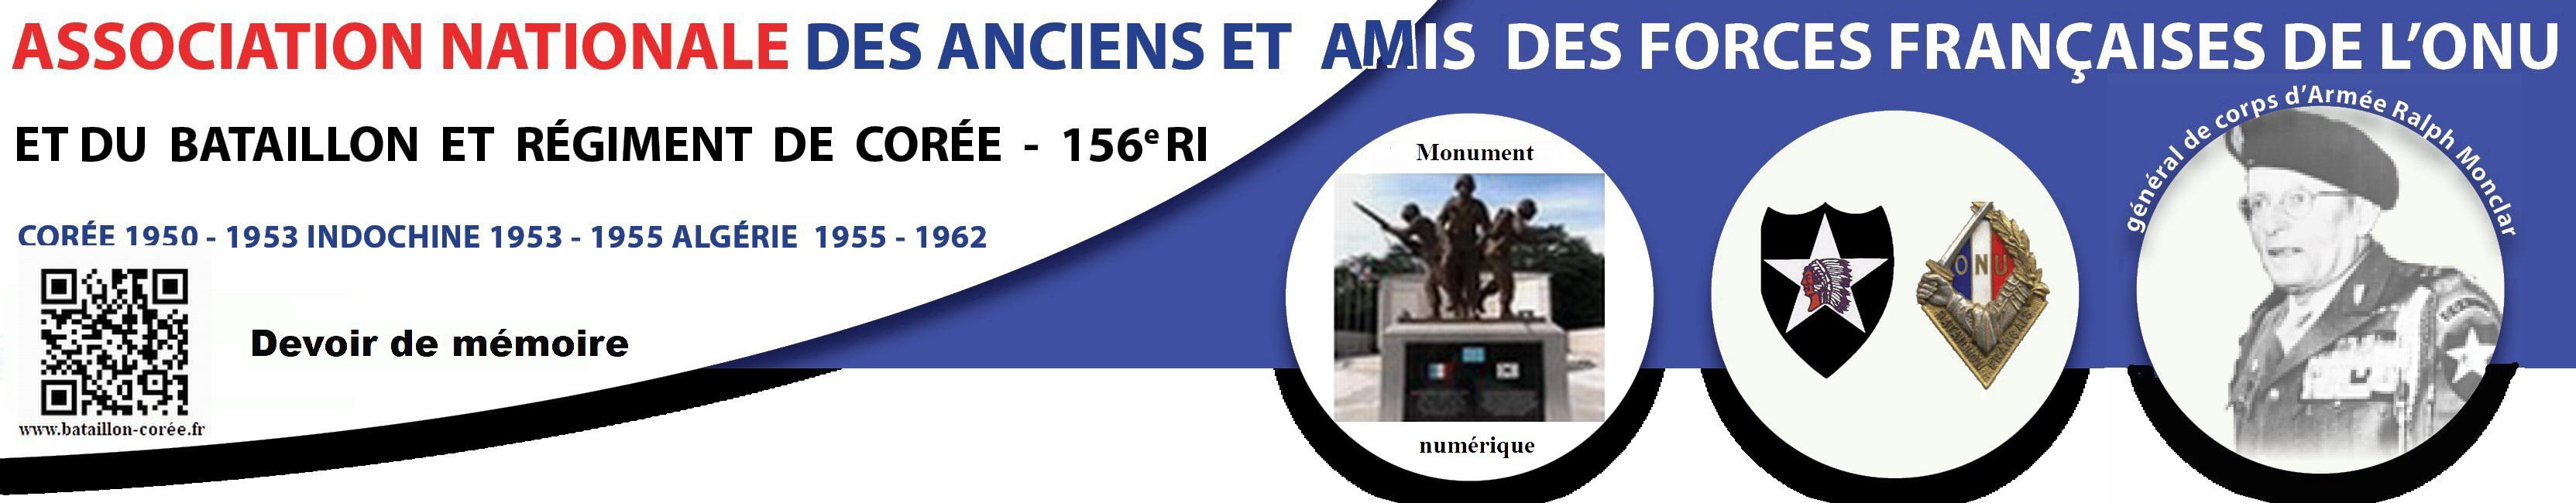 ANAAFF ONU BC/RC-156 RI. Tous droits réservés